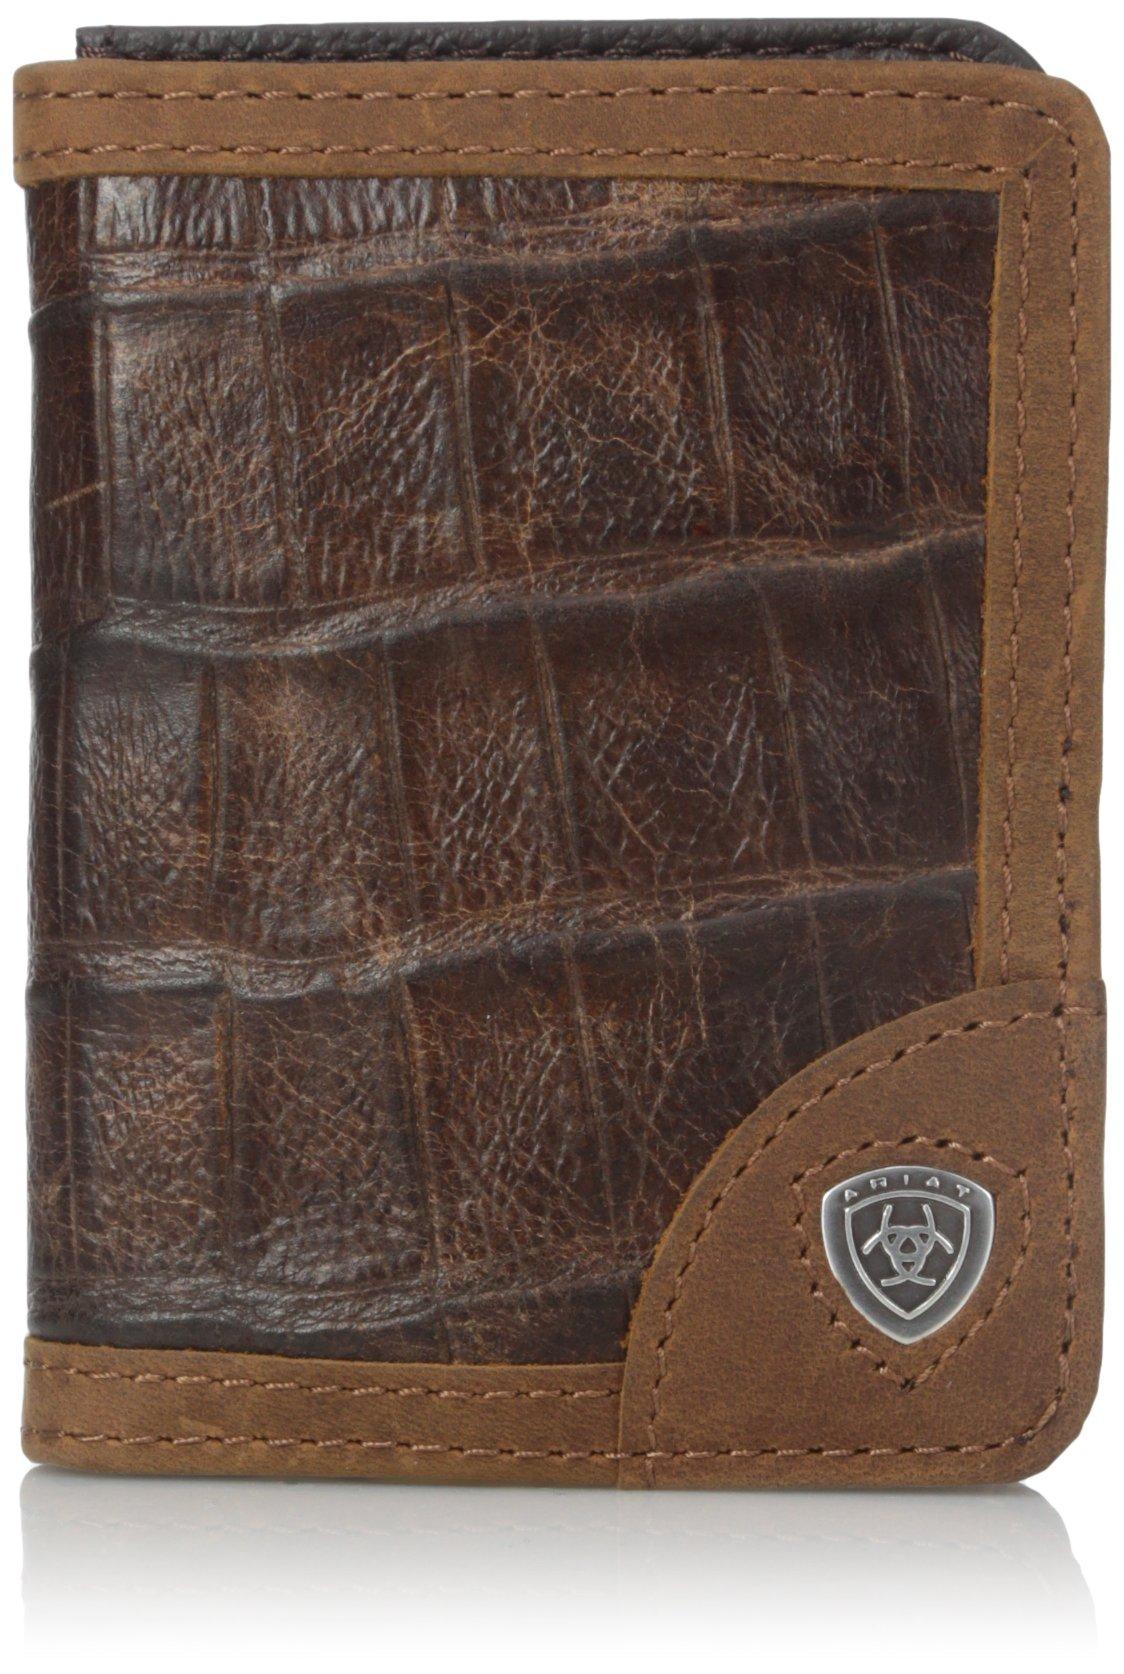 Ariat Men's Gator Print Bi, Brown, One Size